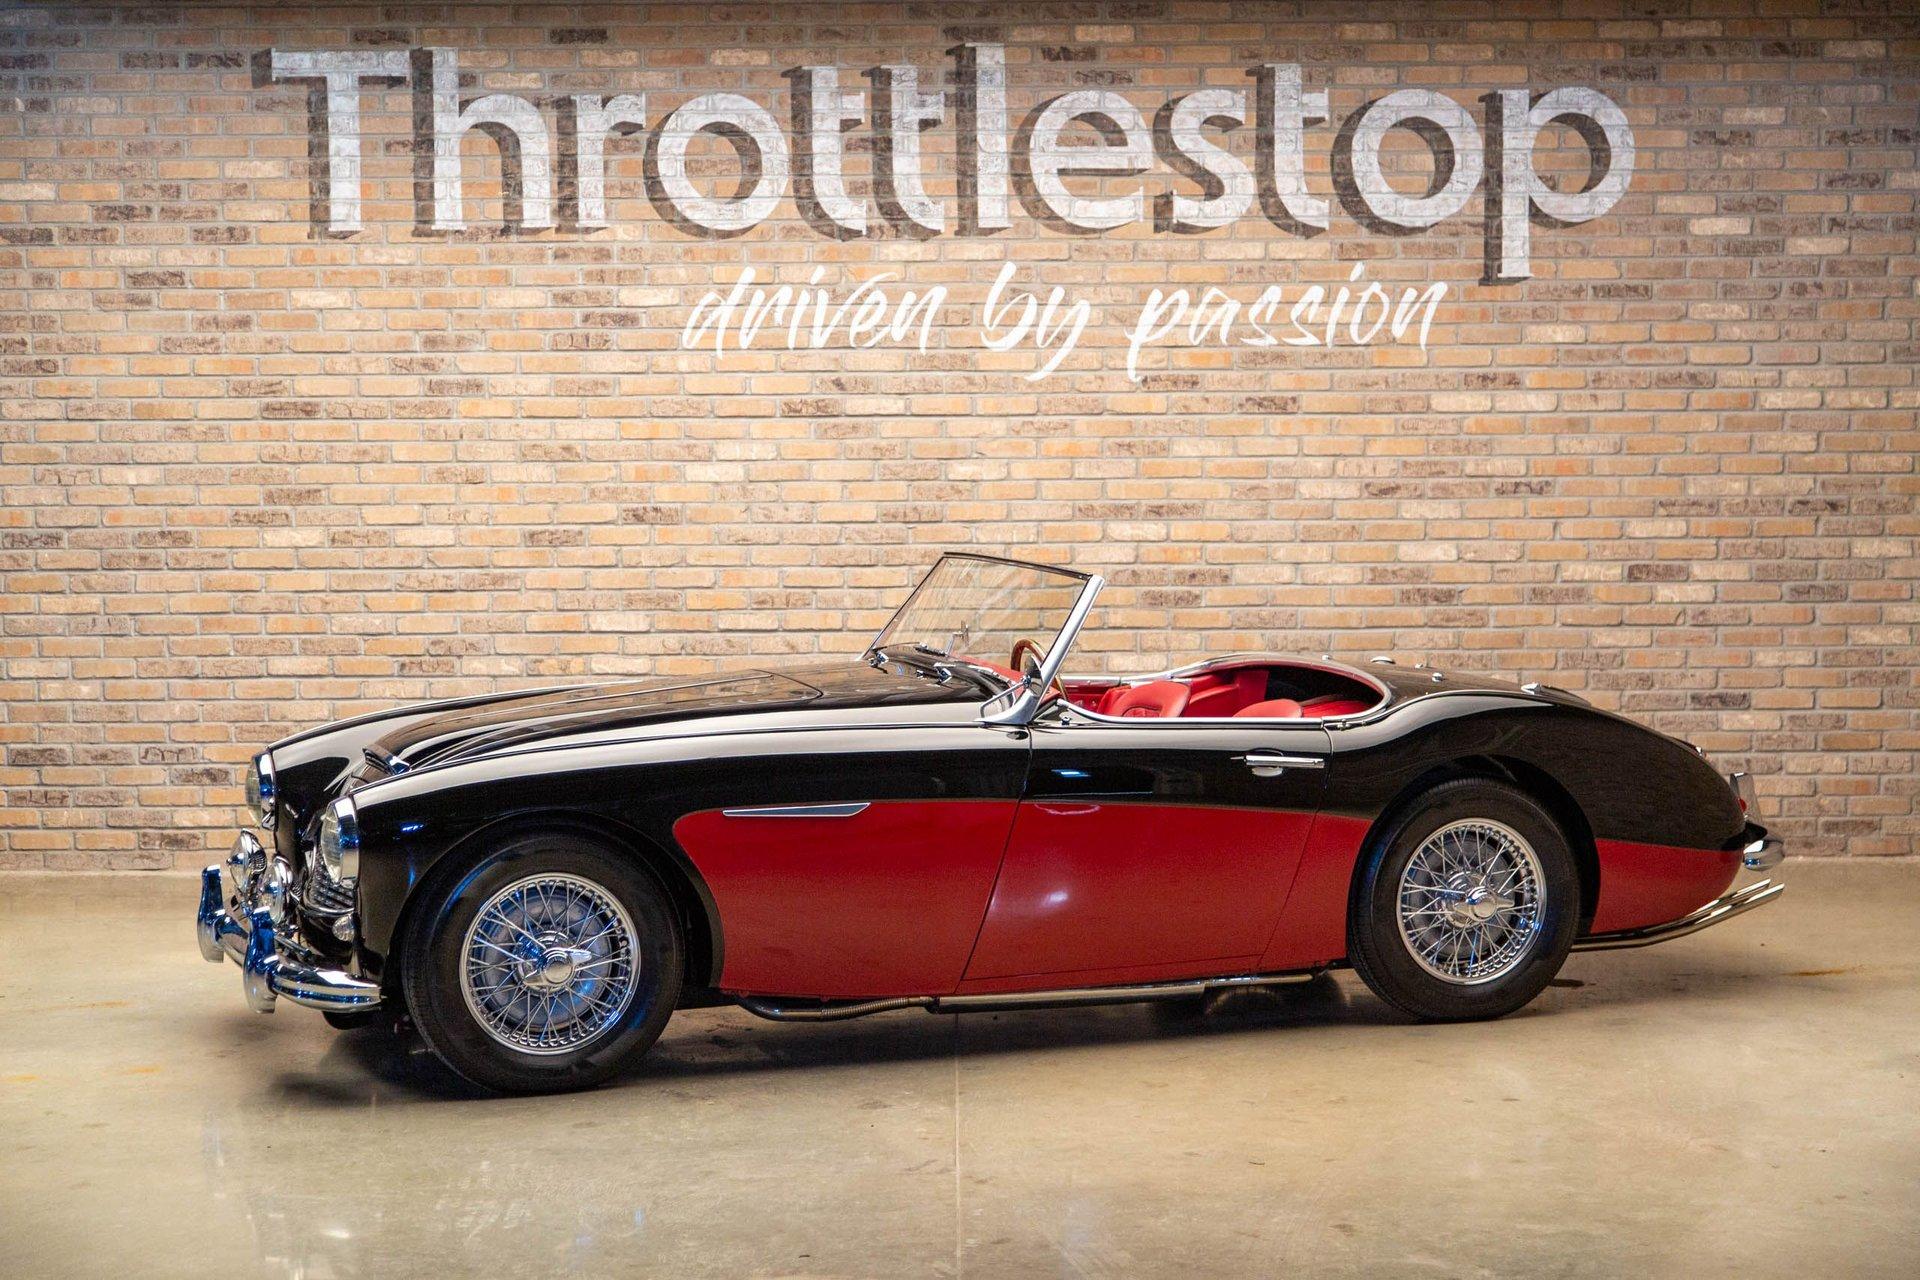 1959 austin healey 100 6 bn6 roadster